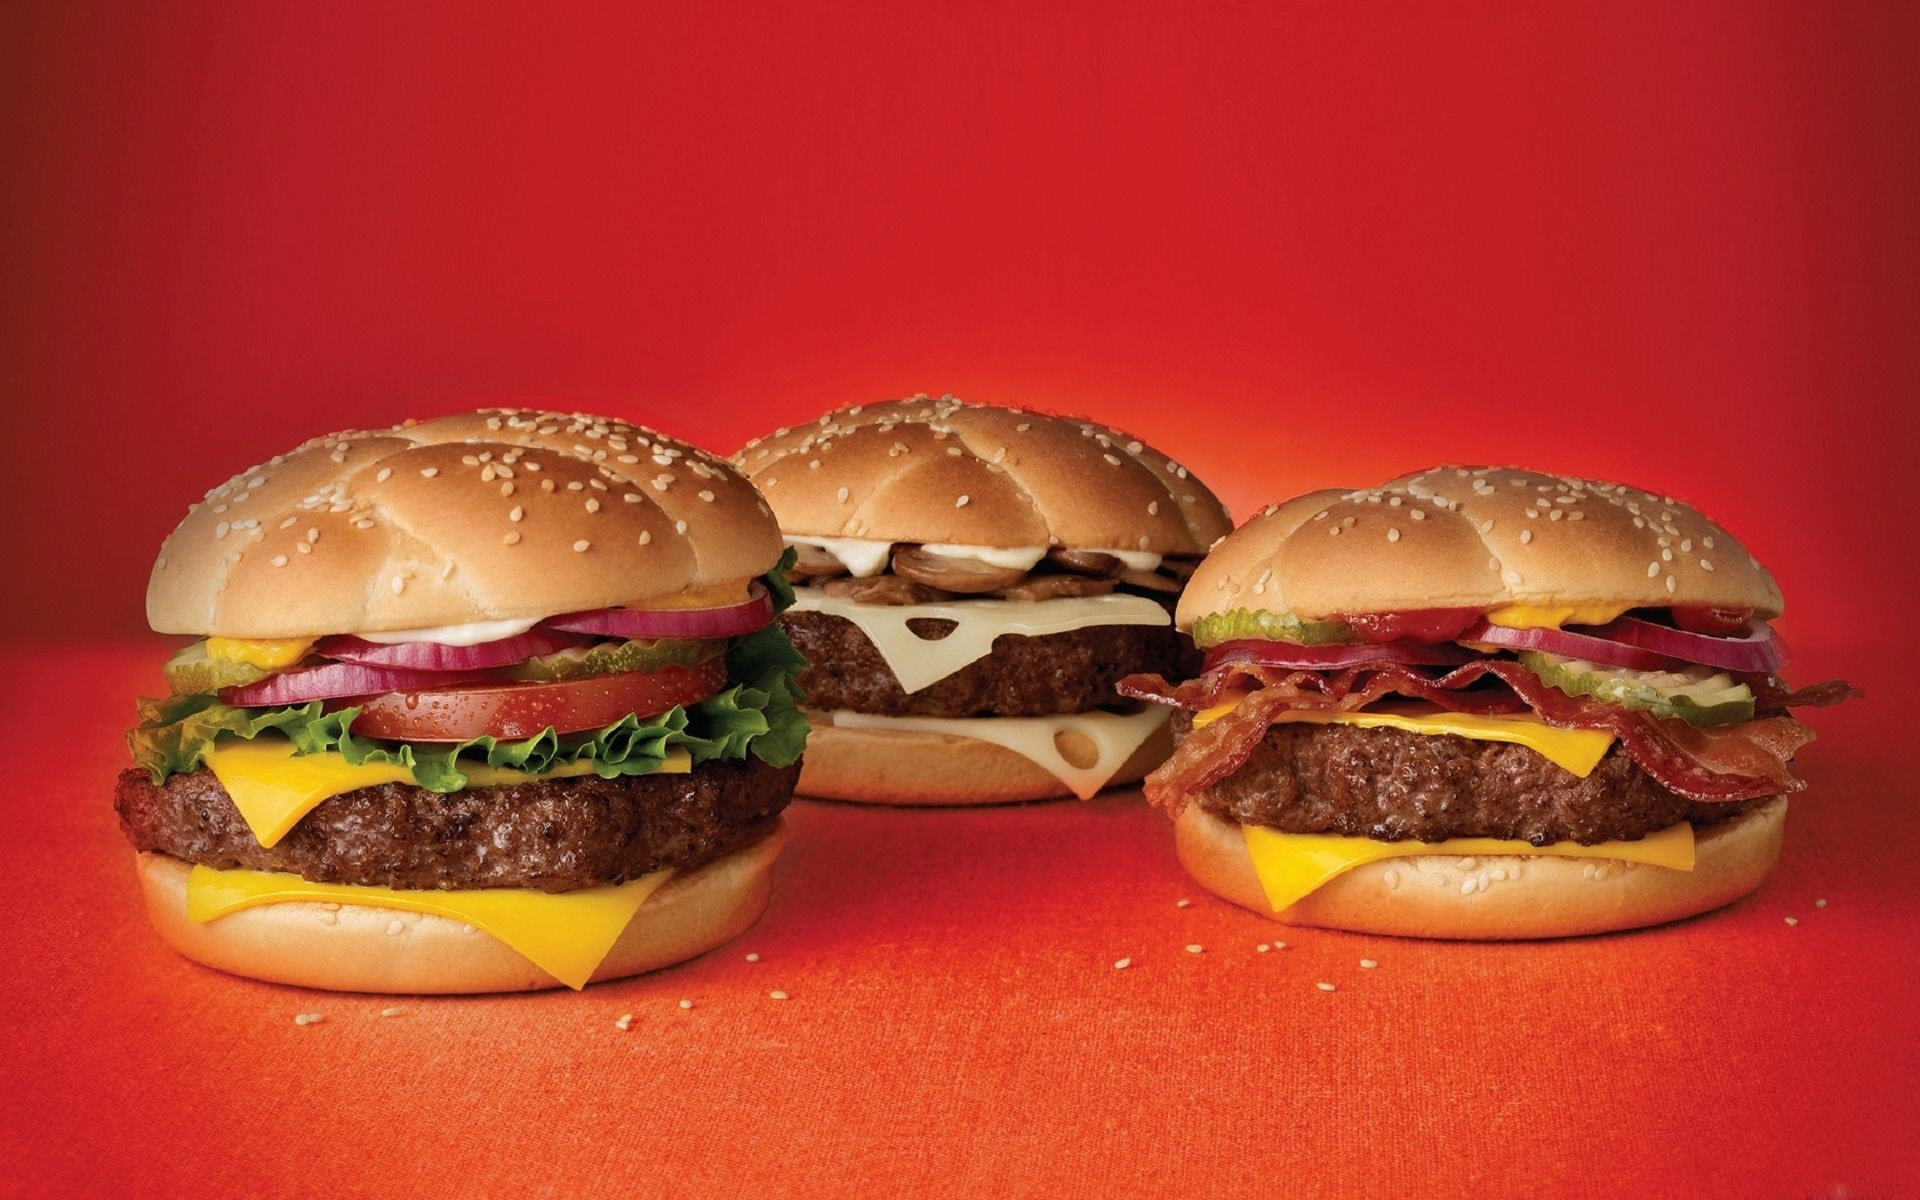 Hamburger-Red-Background-Fast-Food